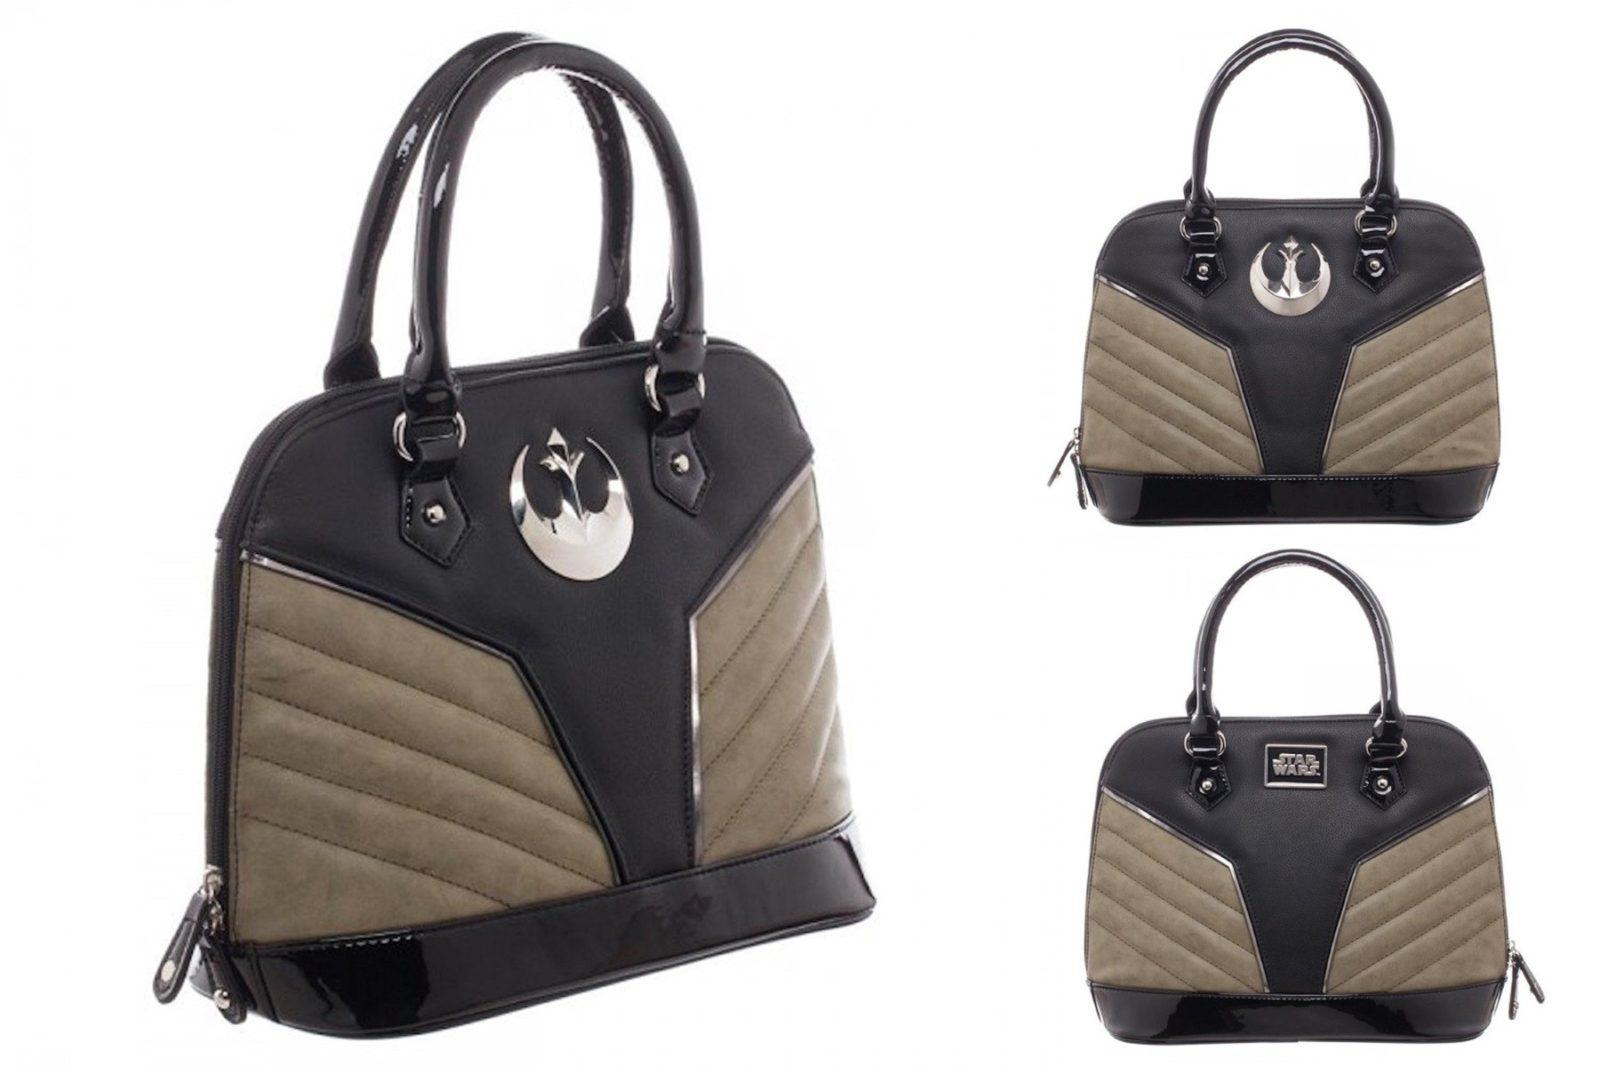 Bioworld x Rogue One Jyn Erso handbag